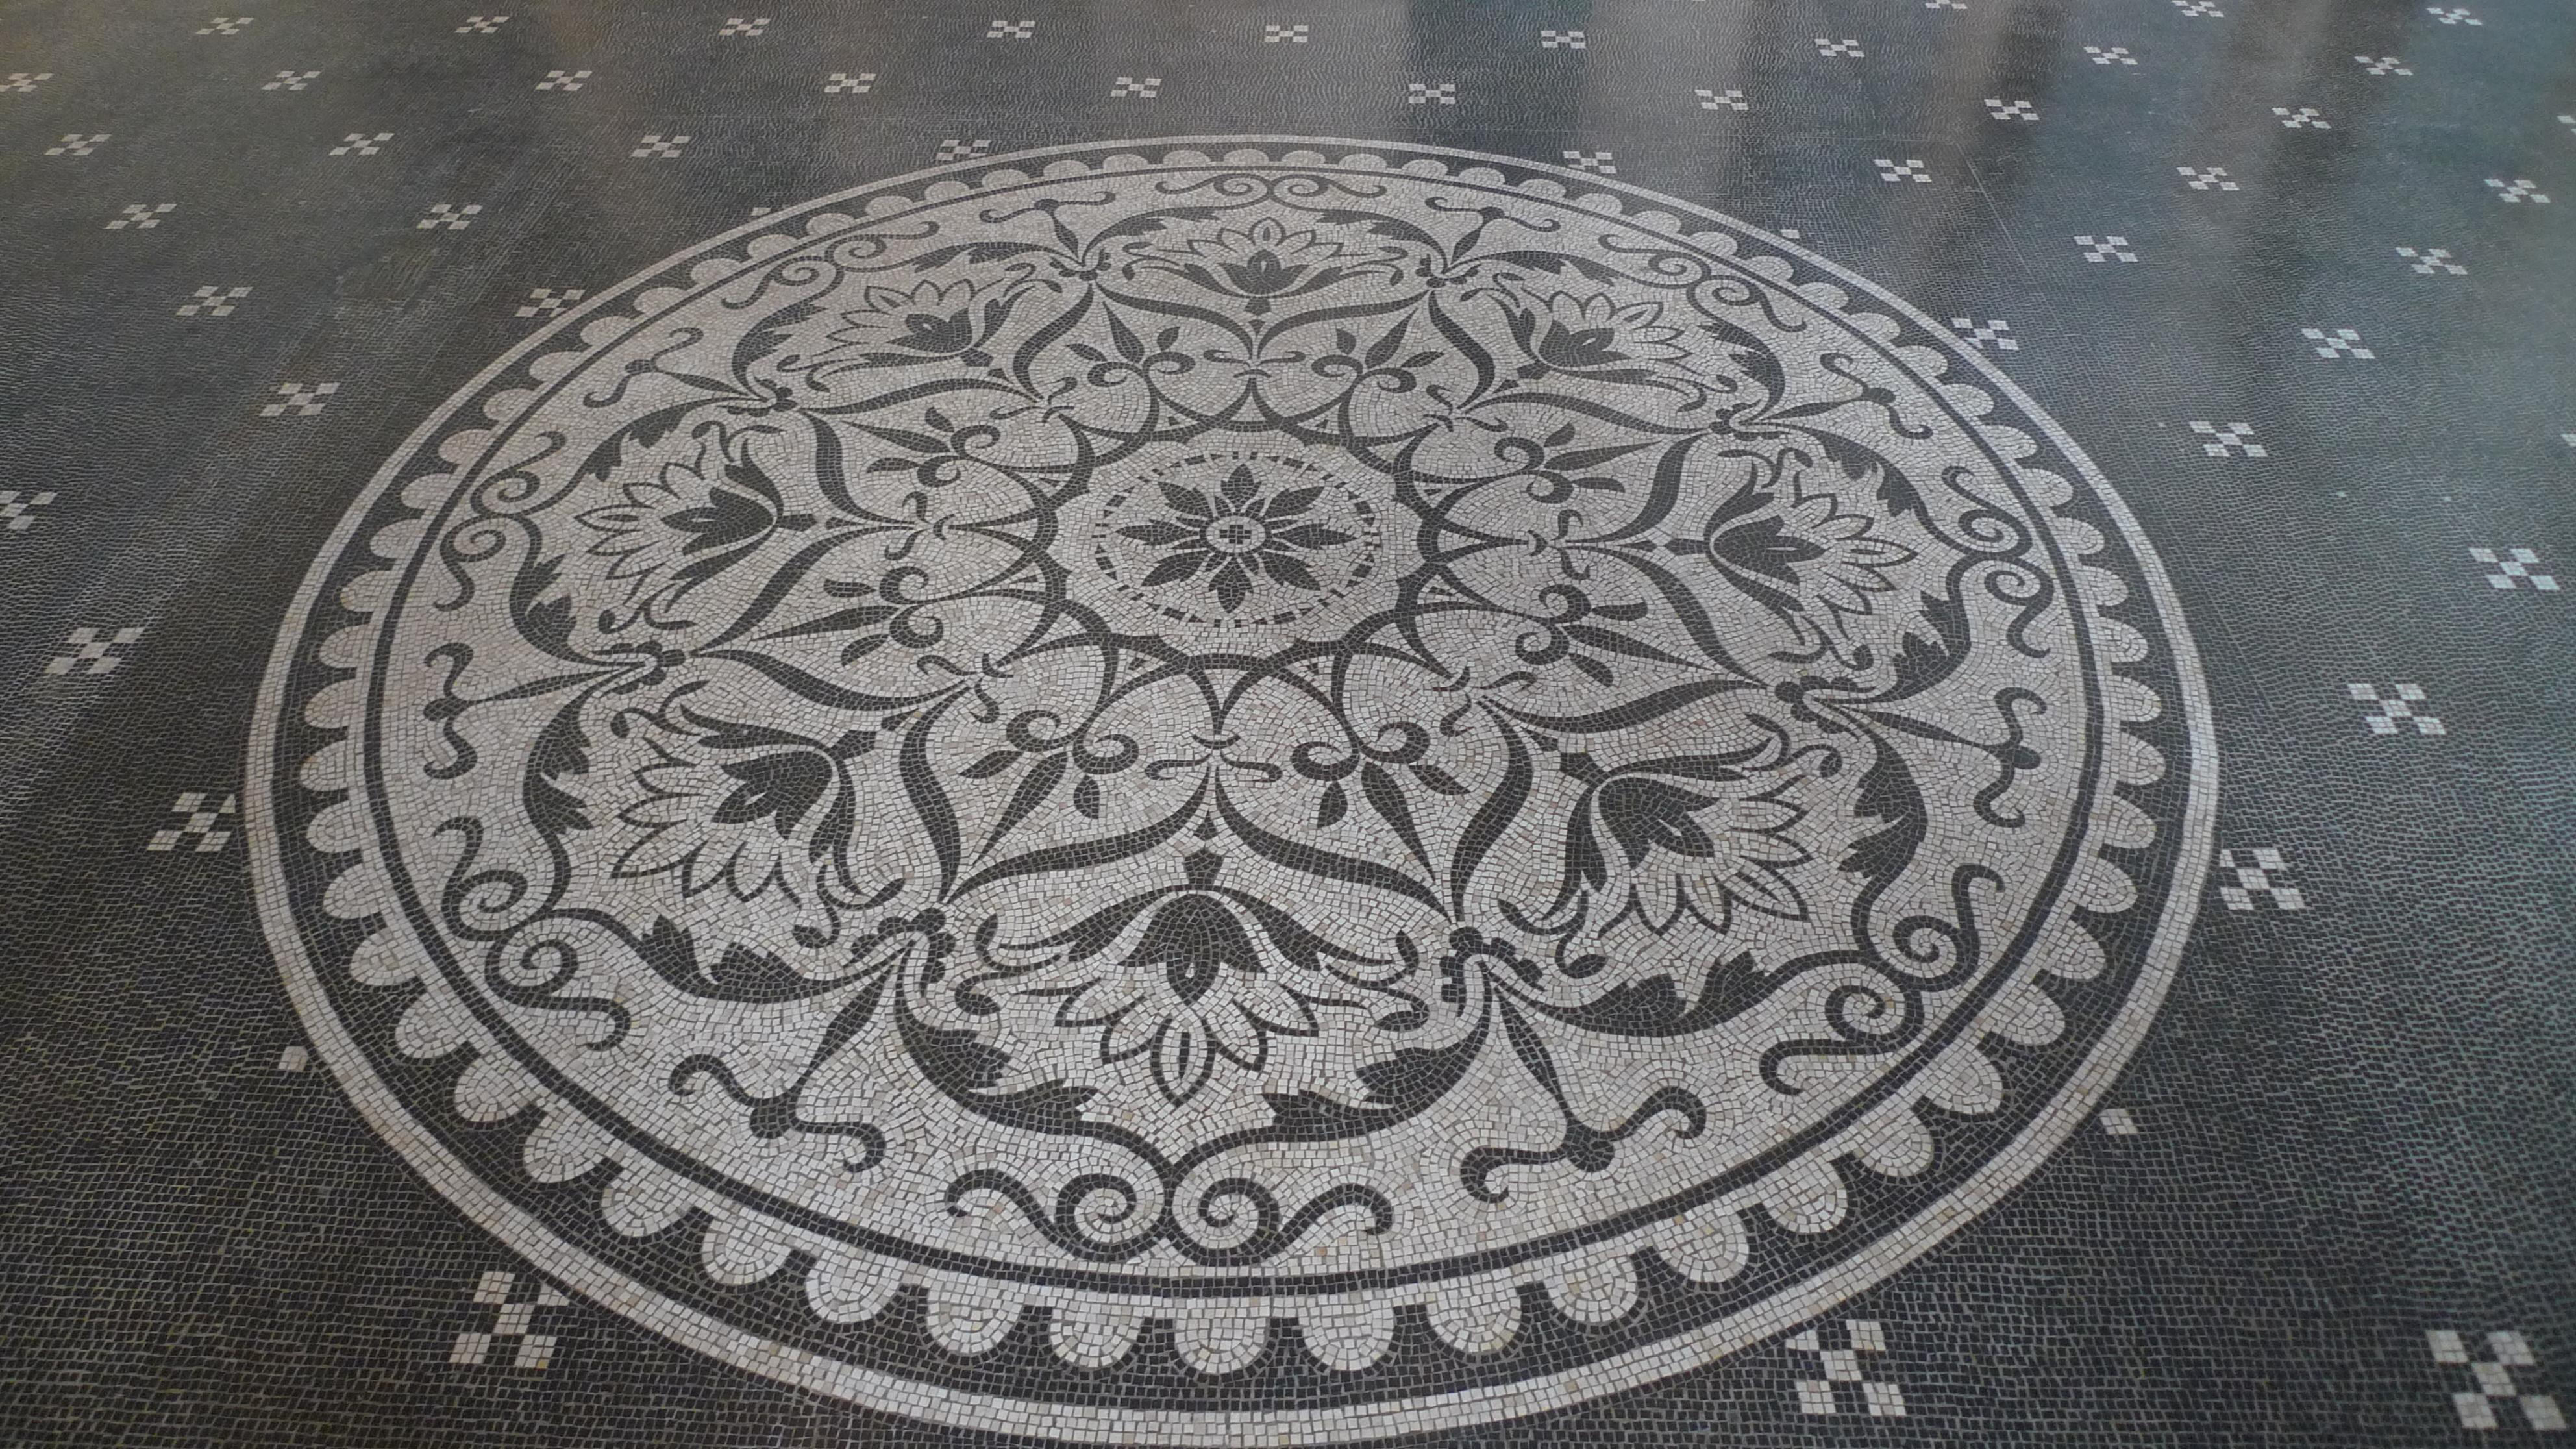 Islamic Mosaic Wallpaper of Islamic Art at Mma When